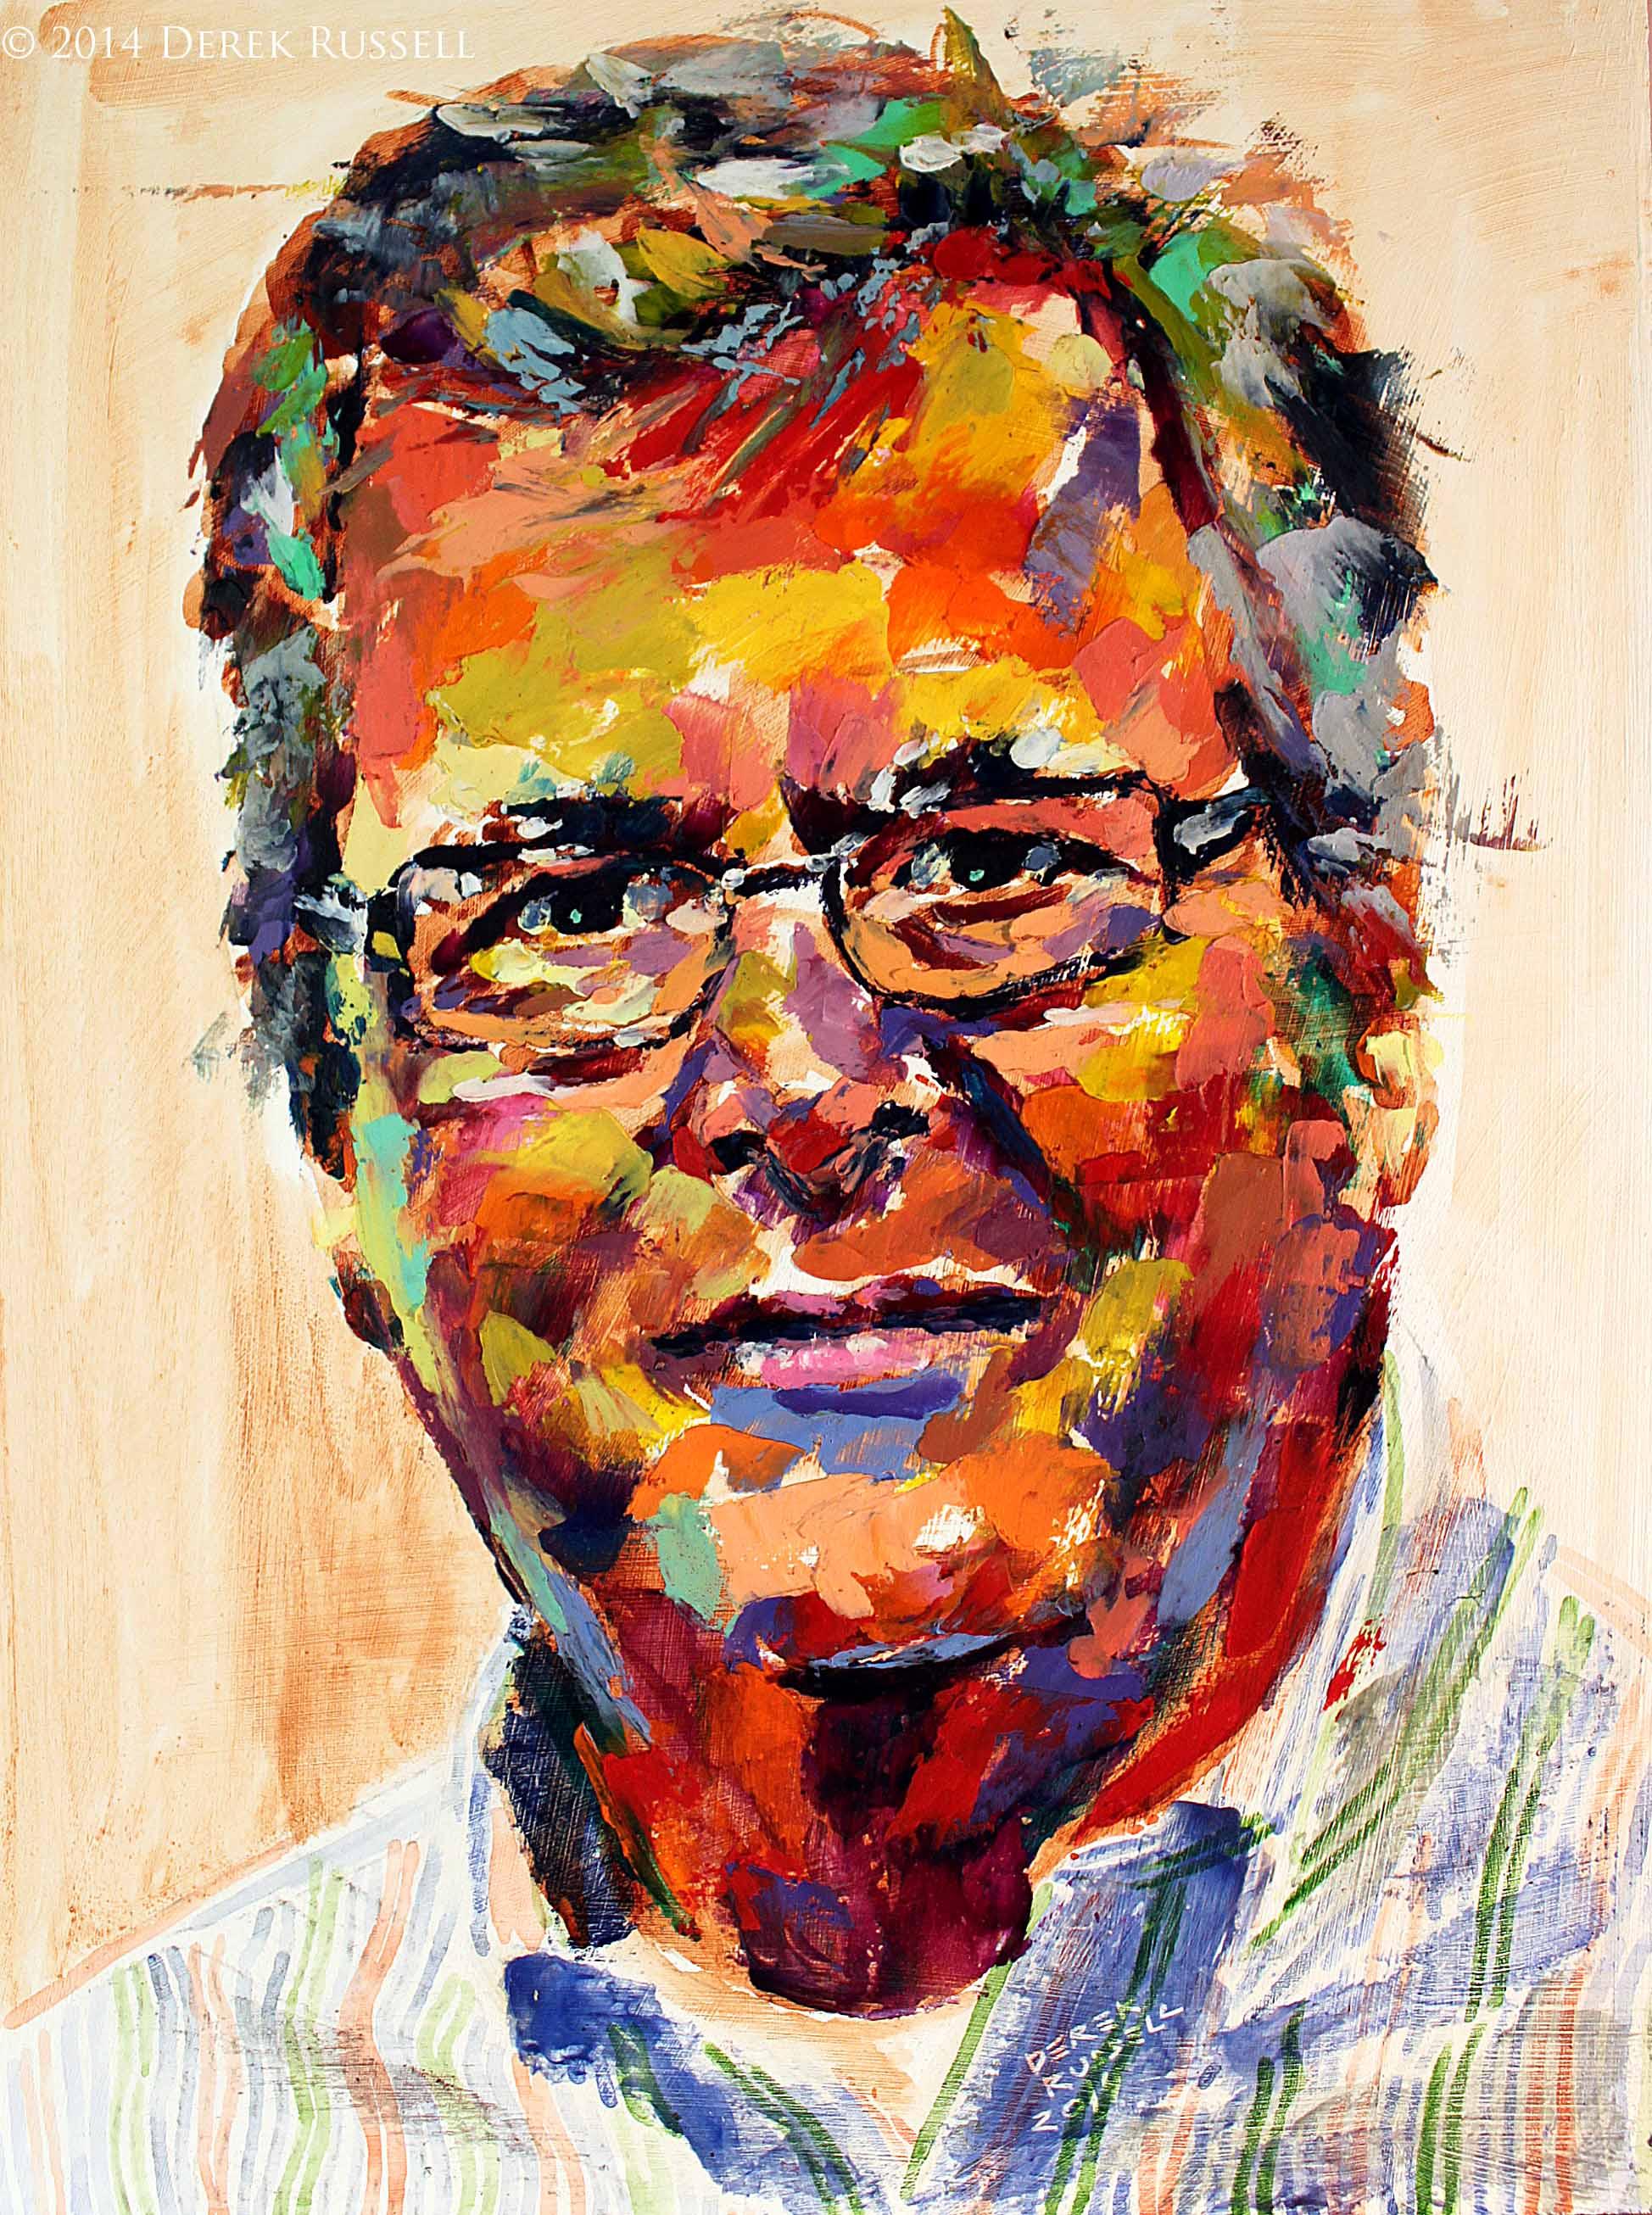 Governor Jeb Bush Original Portrait Pop Art Painting by Derek Russell